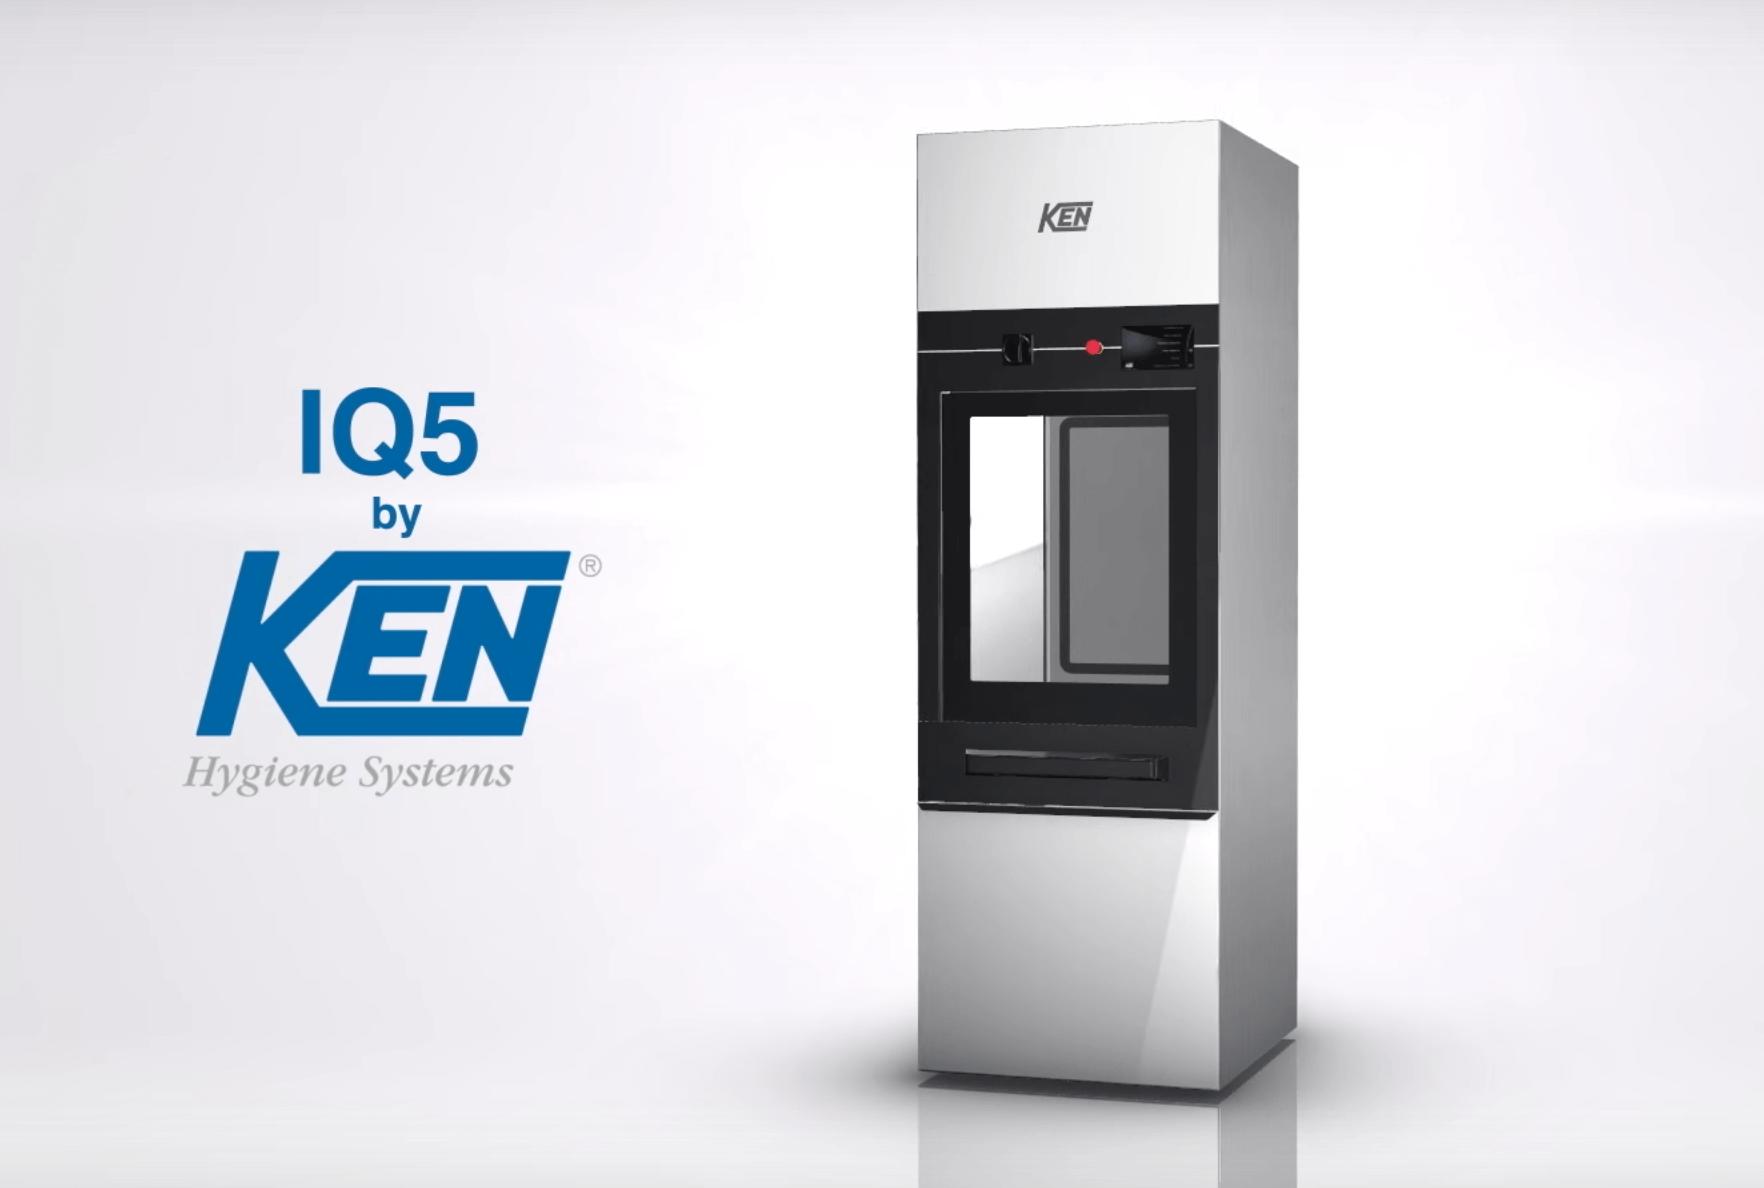 ken-hygiene-systems-iq5